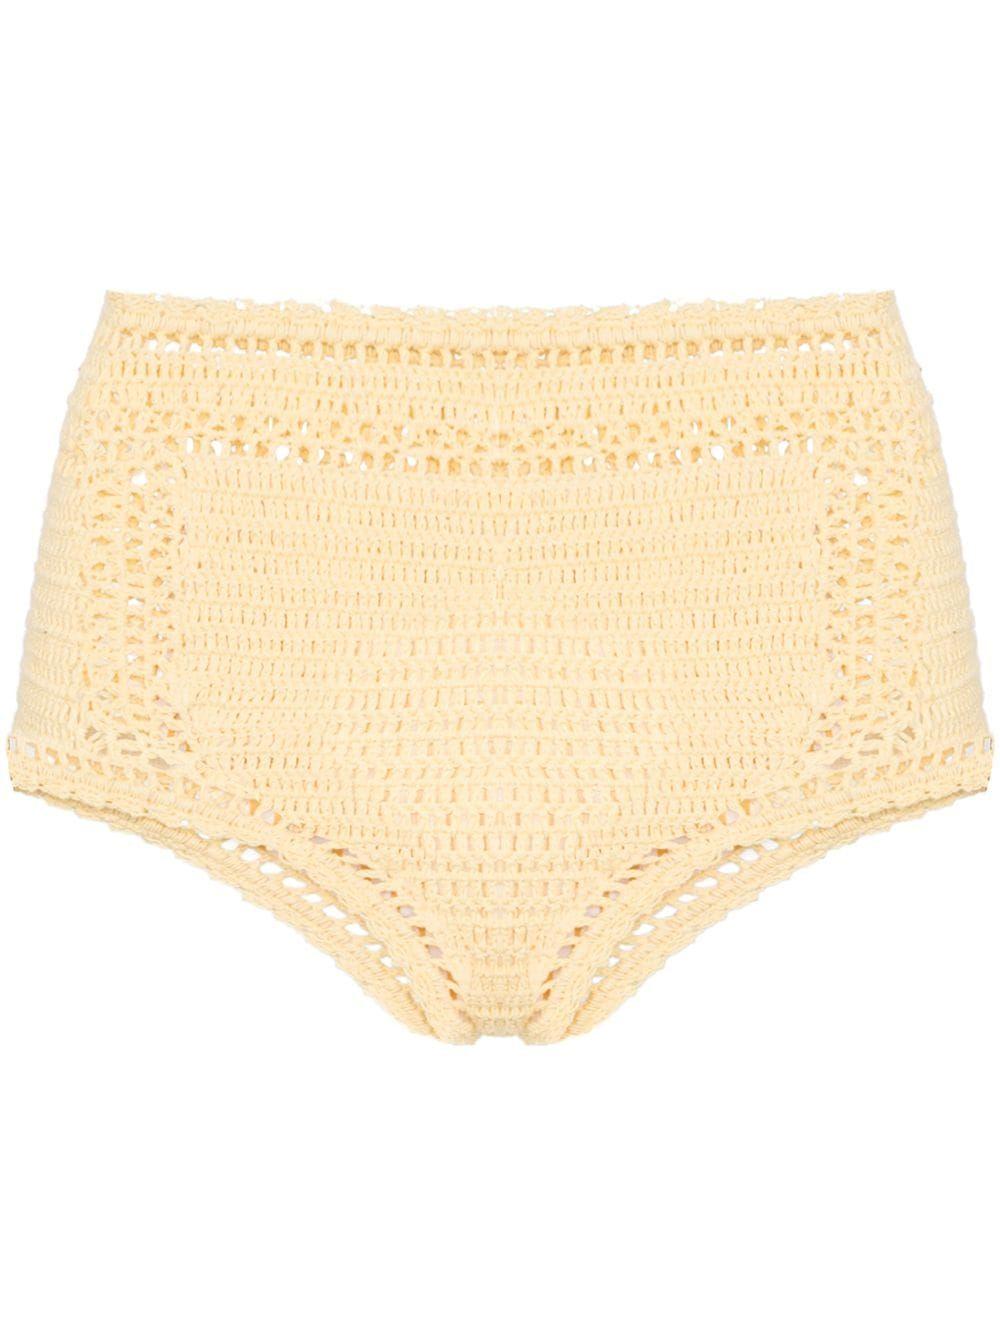 She Made Me Essential Crochet Bikini Bottoms #crochetbikinibottoms